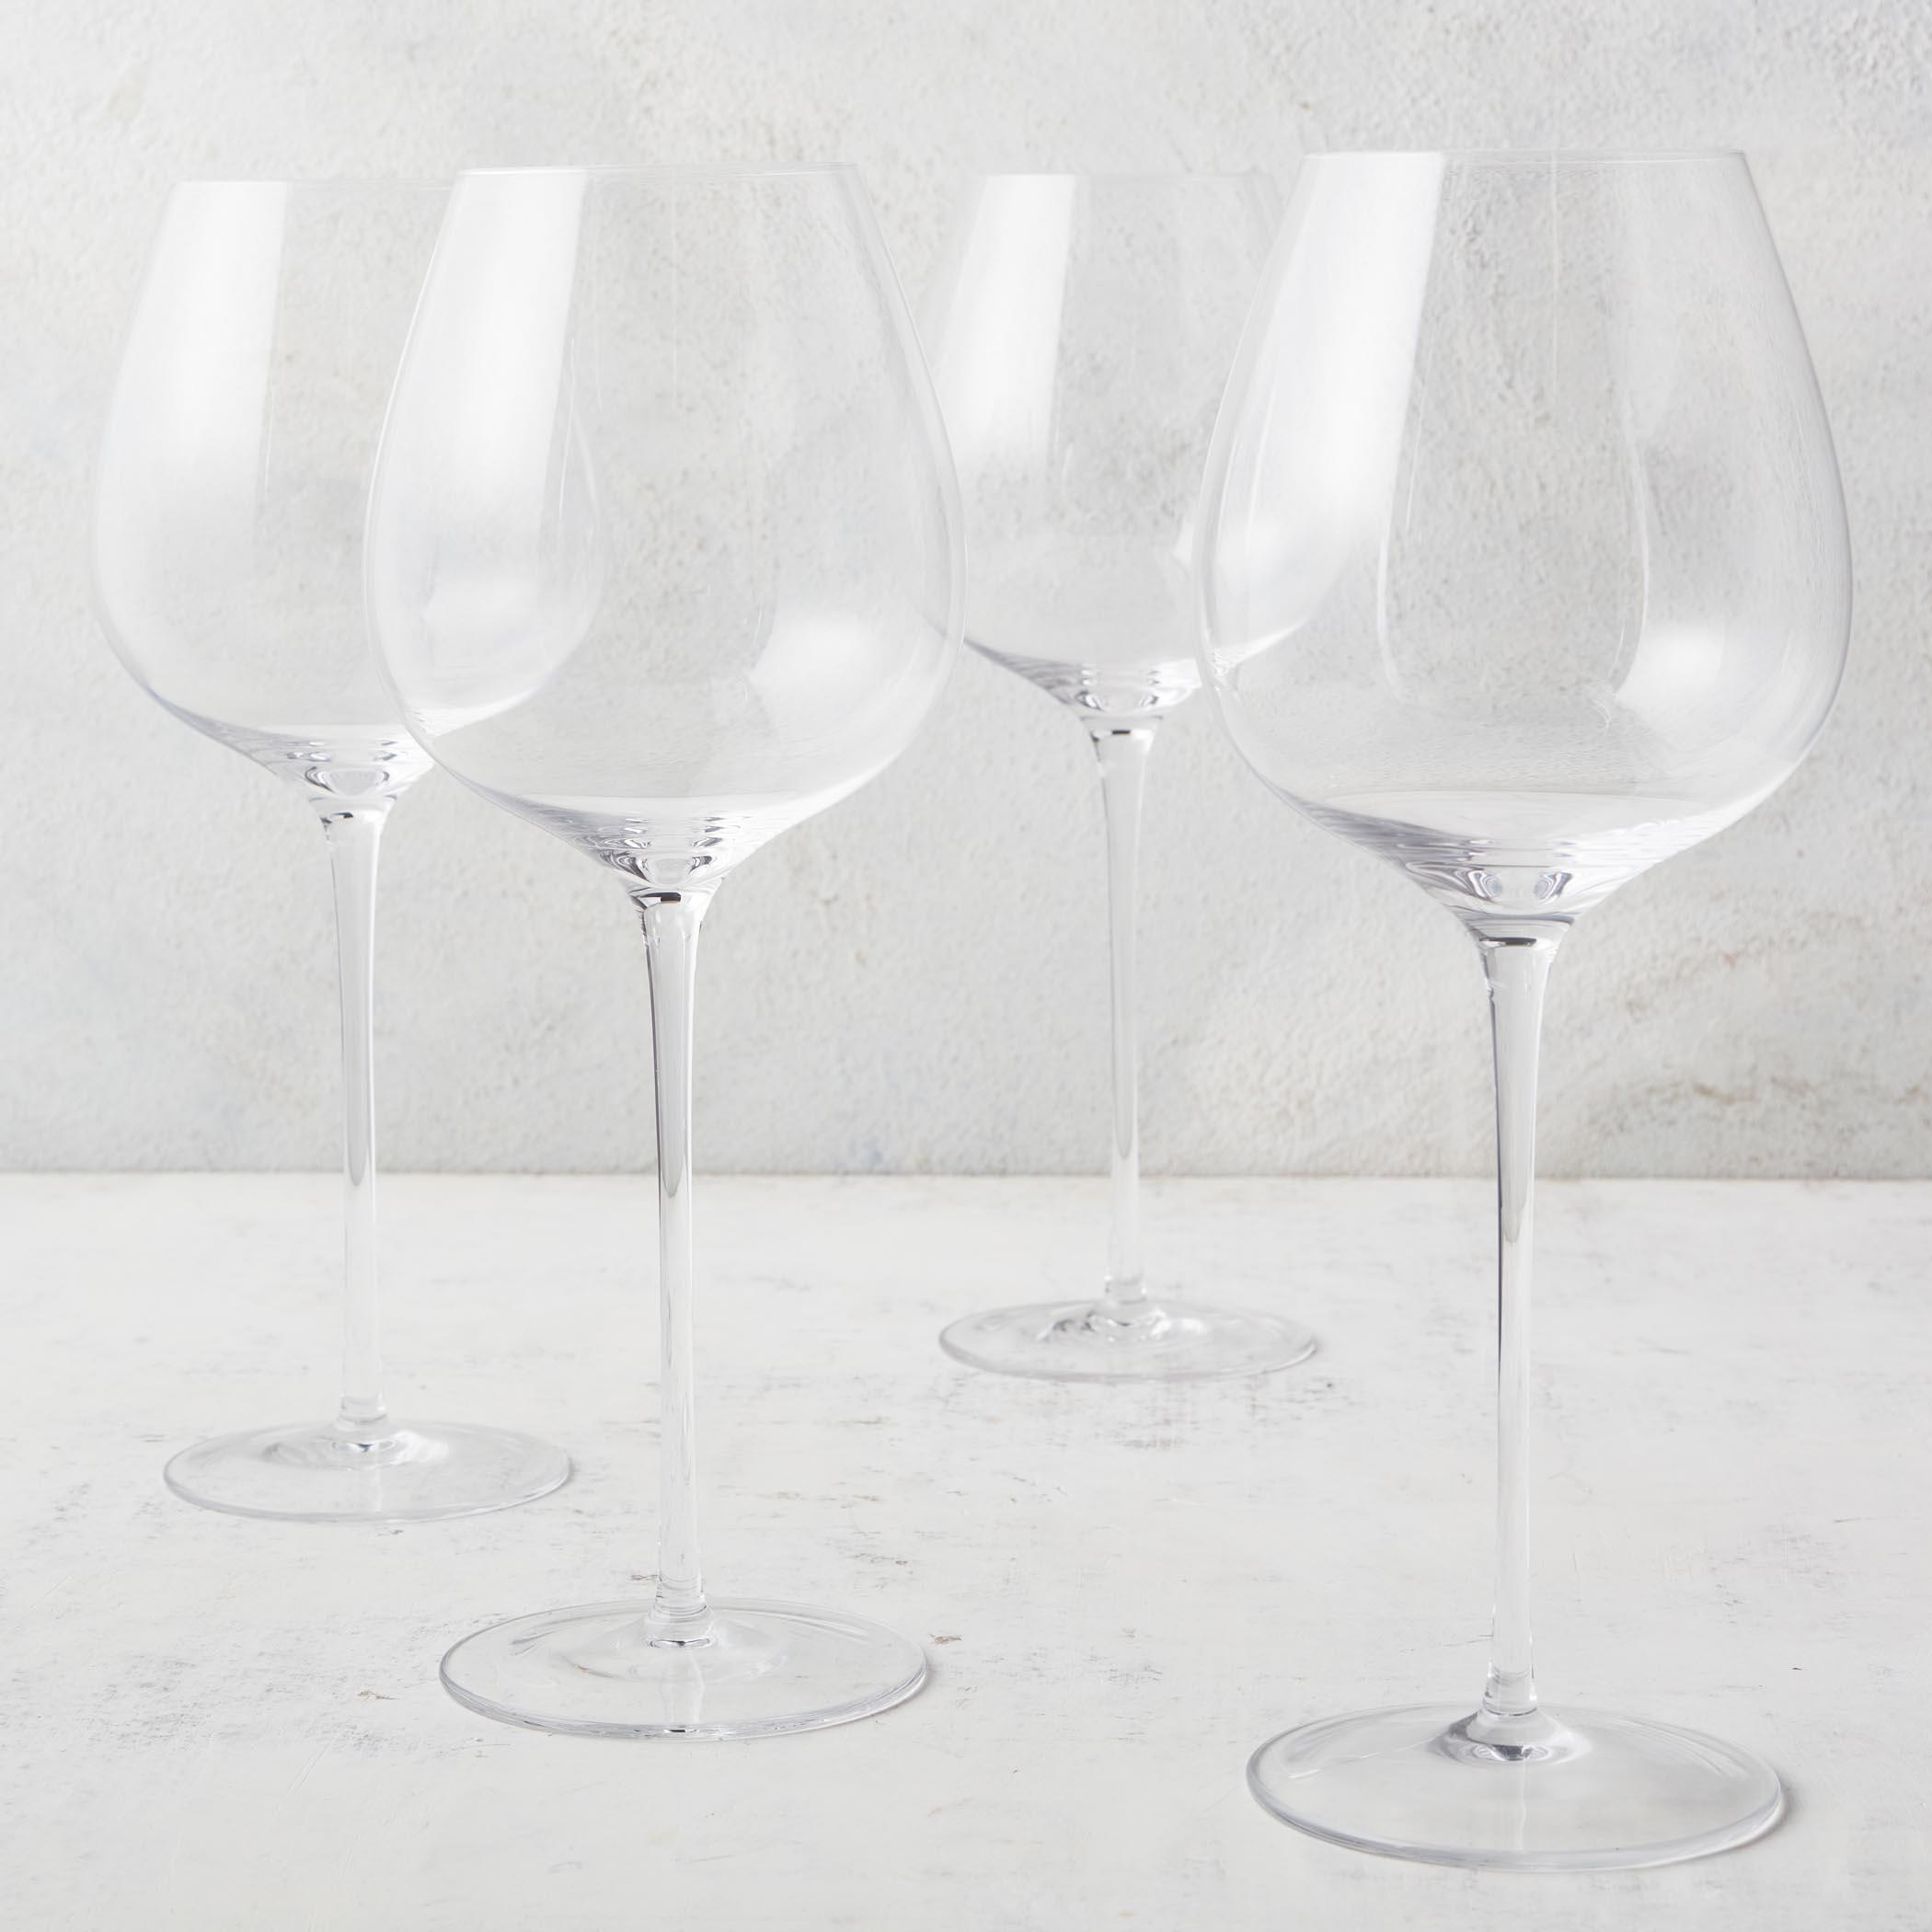 red wine - set of 4